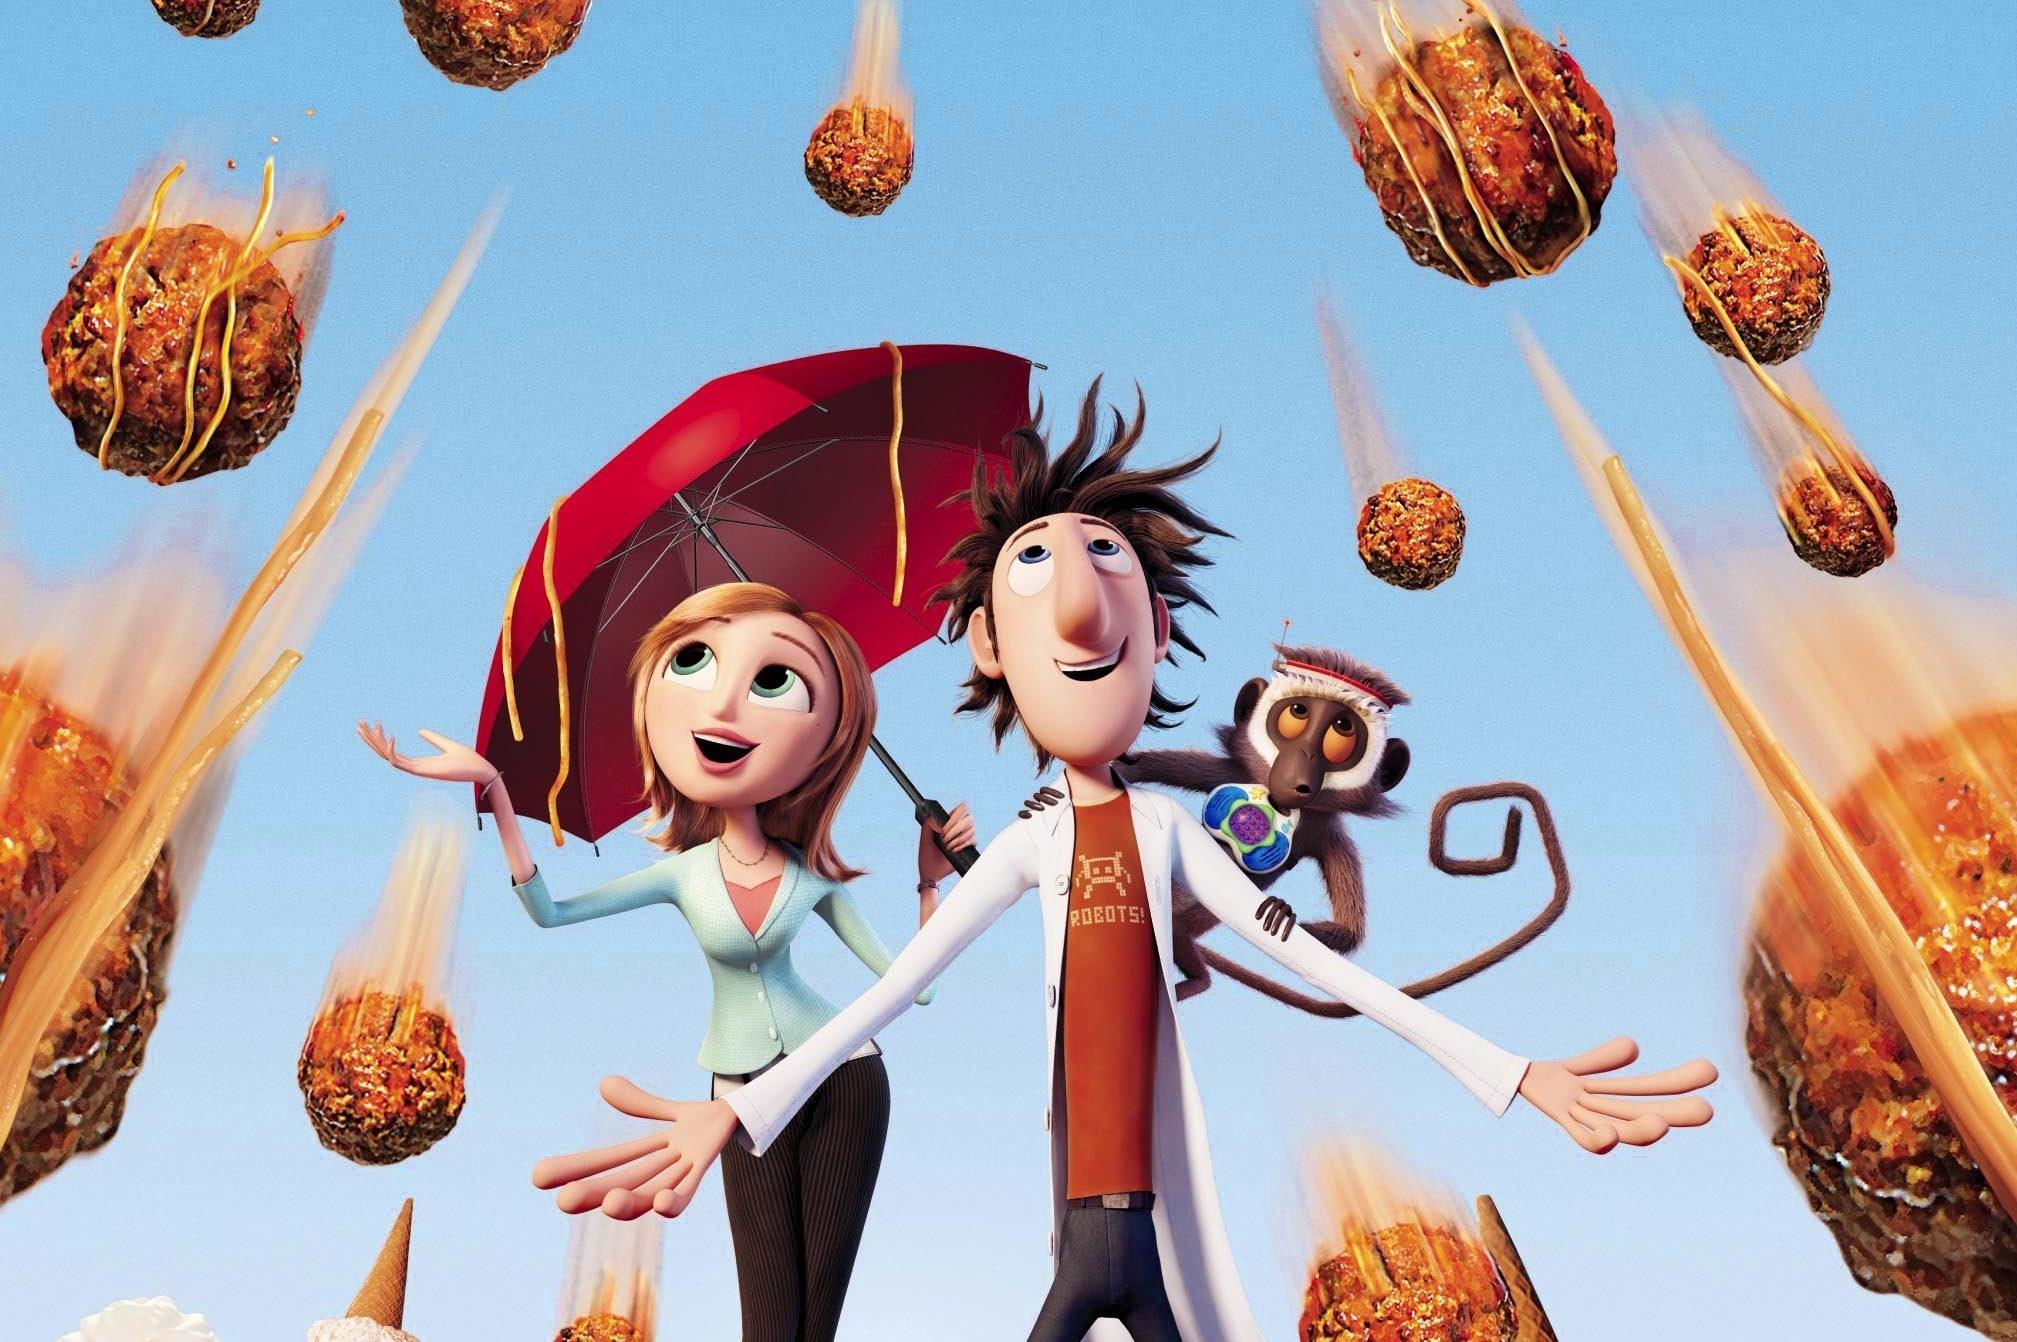 25 Best Cartoon Movies for Family Movie Night